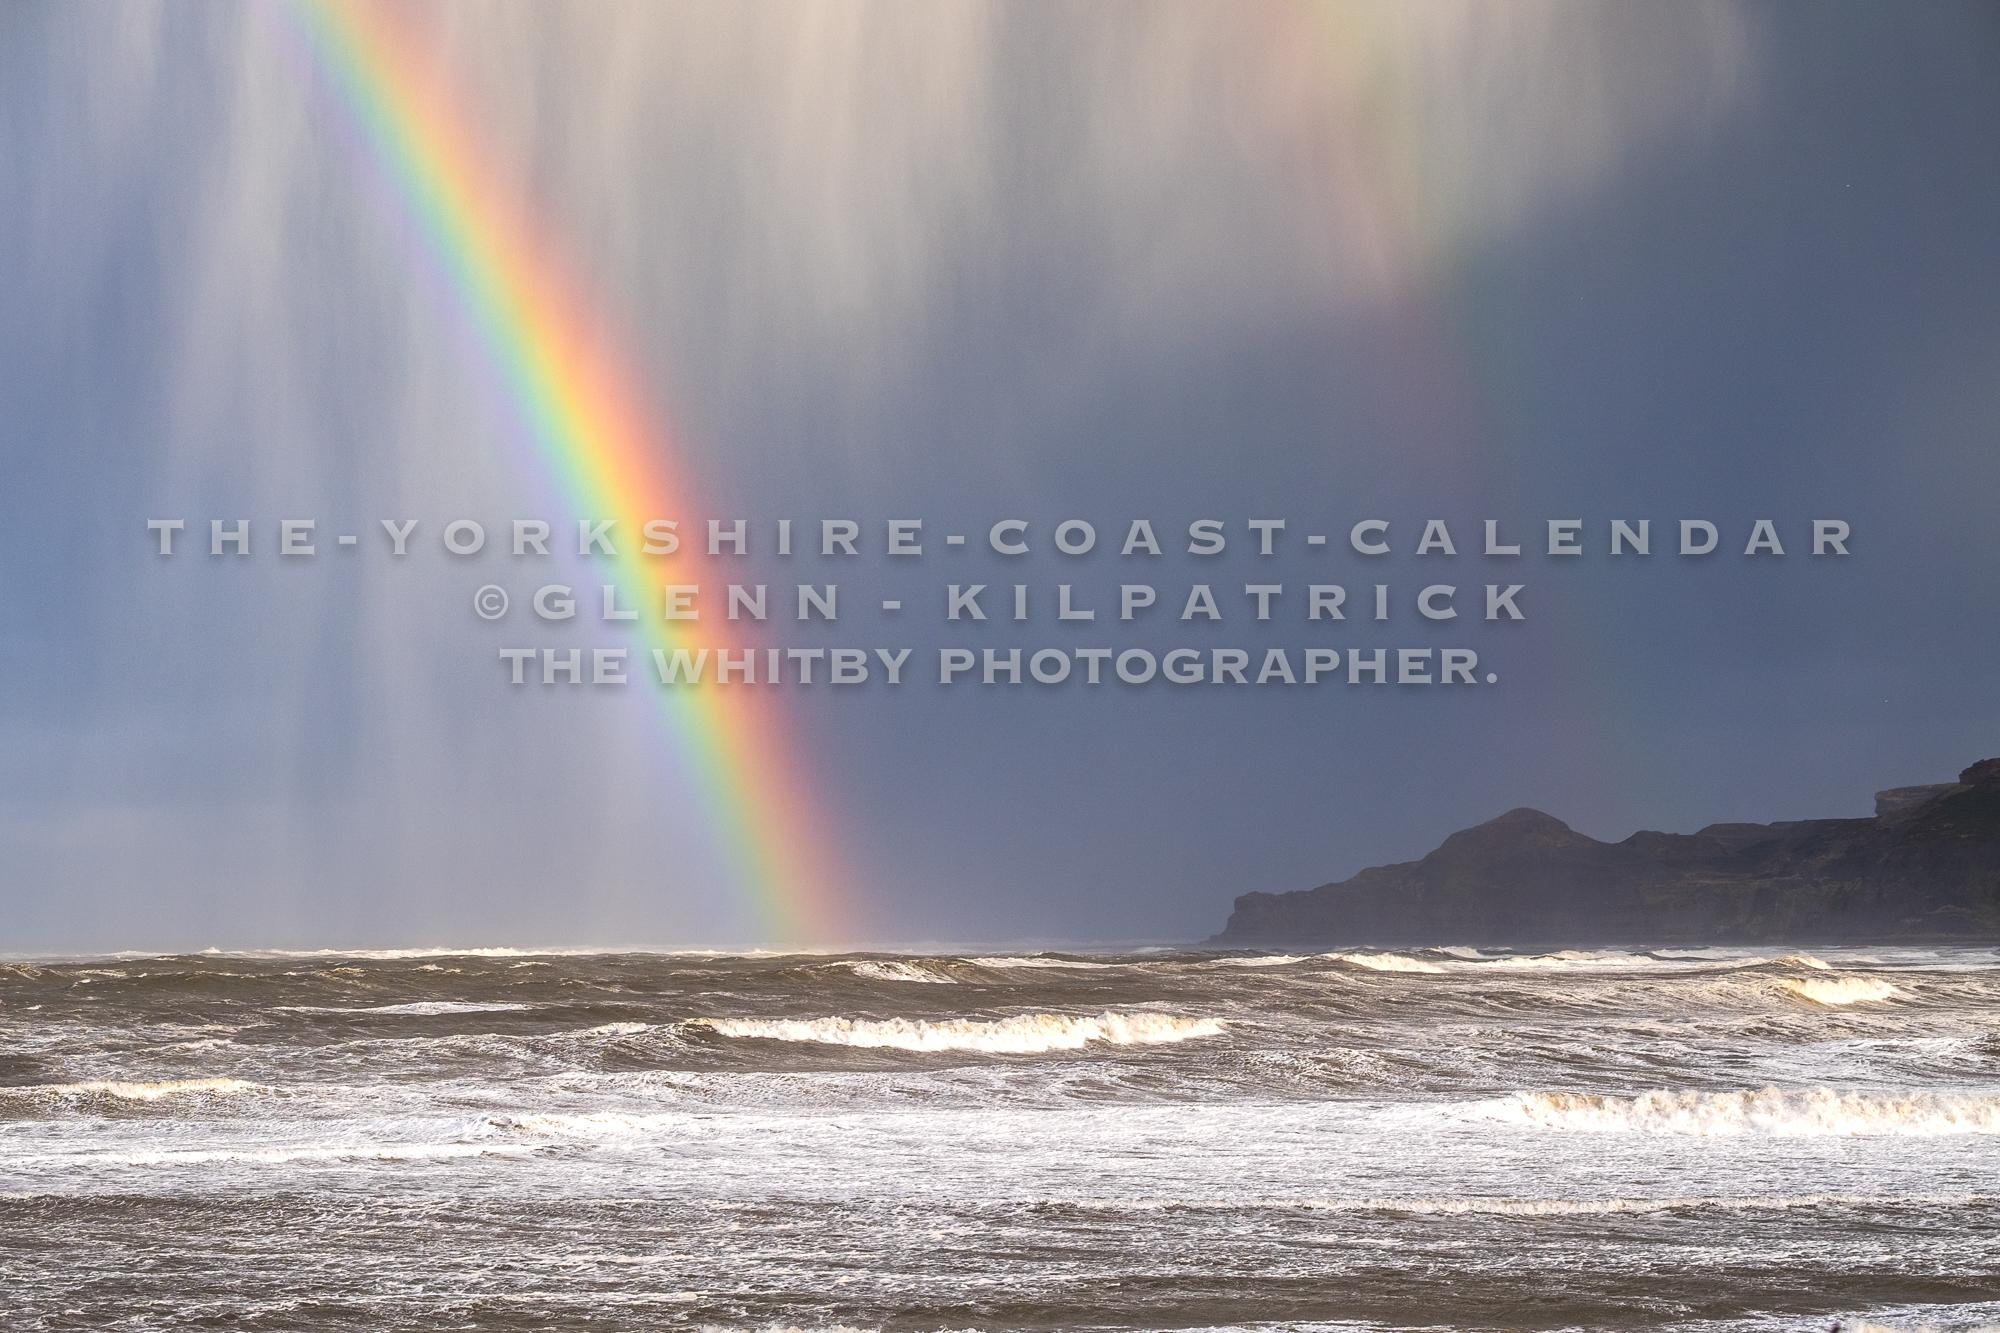 Rainbow Shines Through Stormy Skies At Kettleness - The Yorkshire Coast Calendar 2018 By Glenn Kilpatrick.